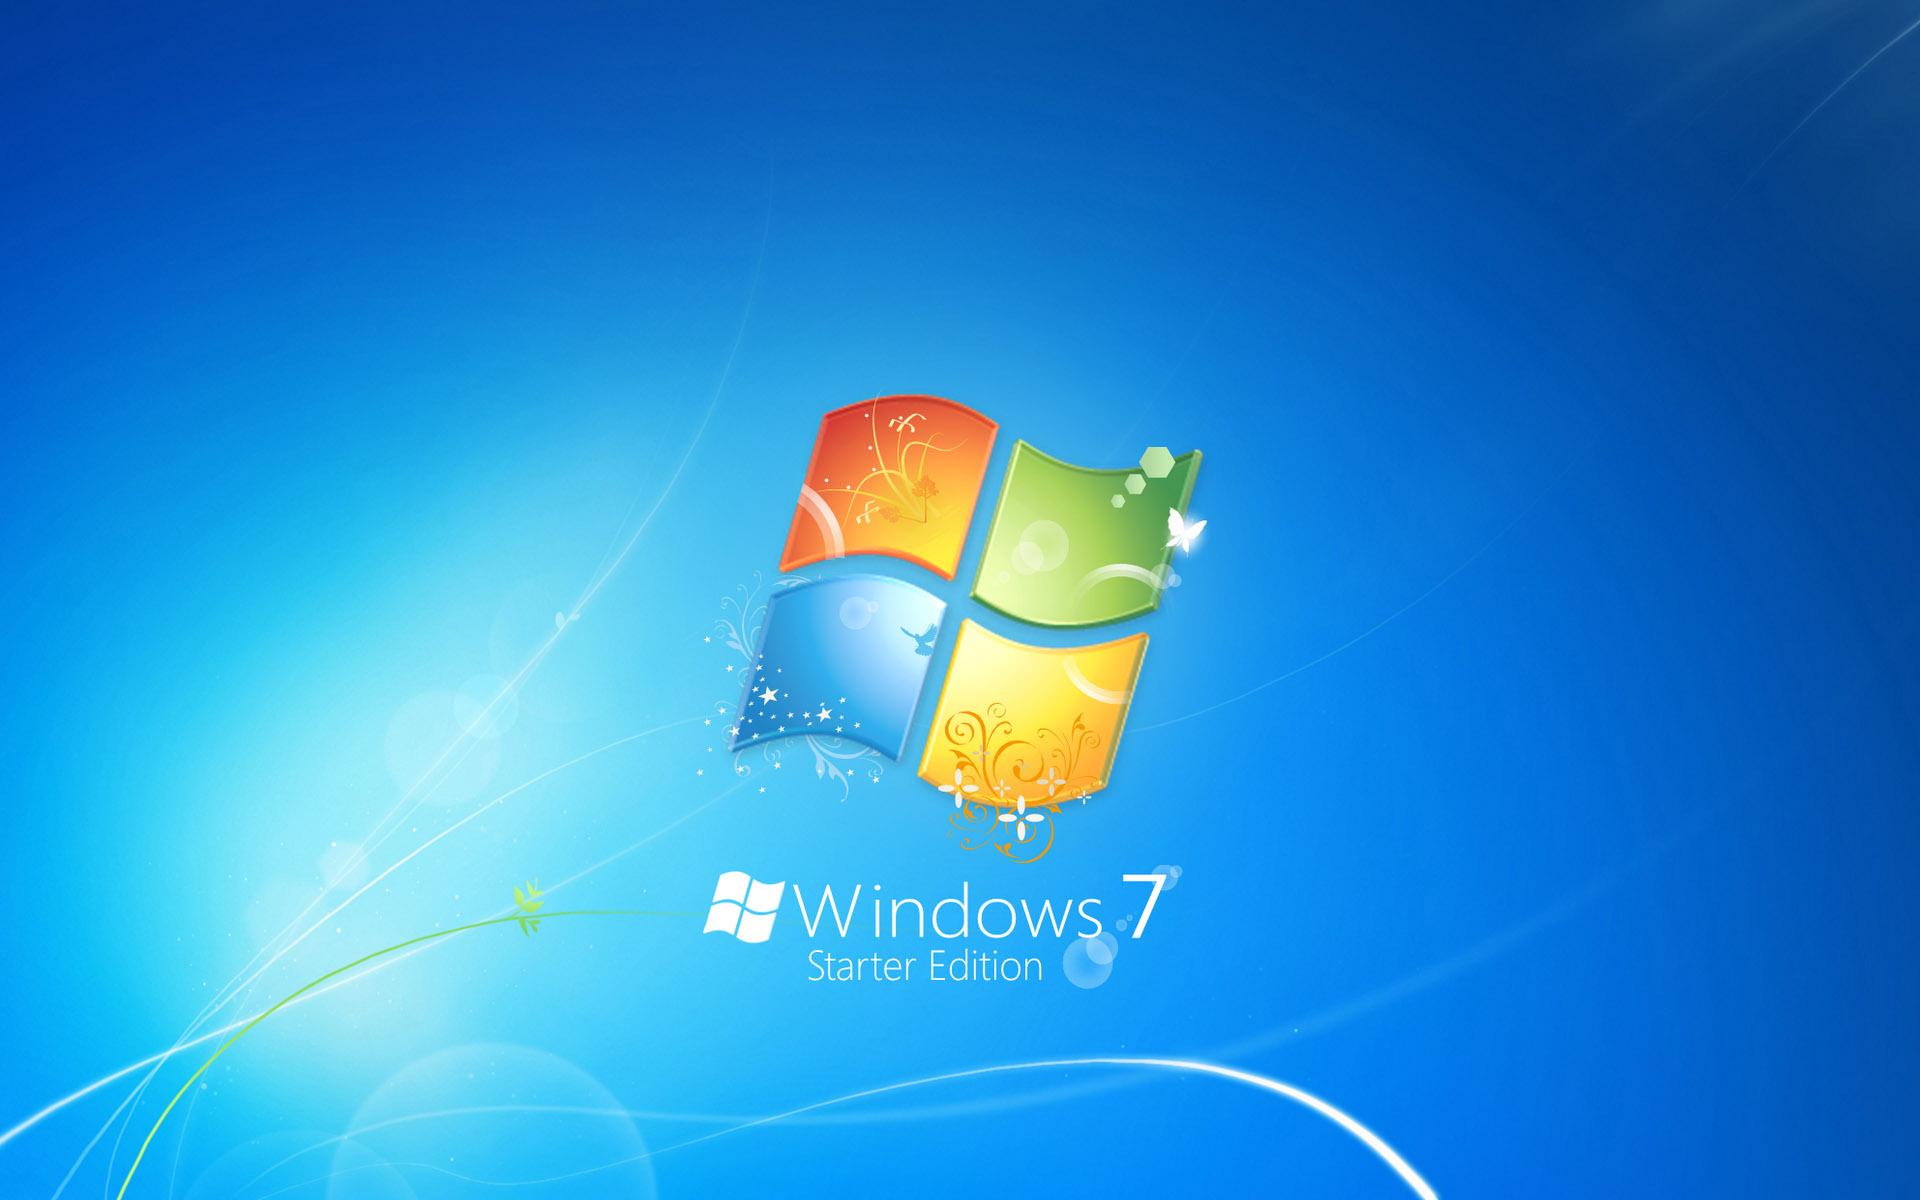 Windows 7 Starter Edition   Windows 7 Wallpaper 26875574 1920x1200